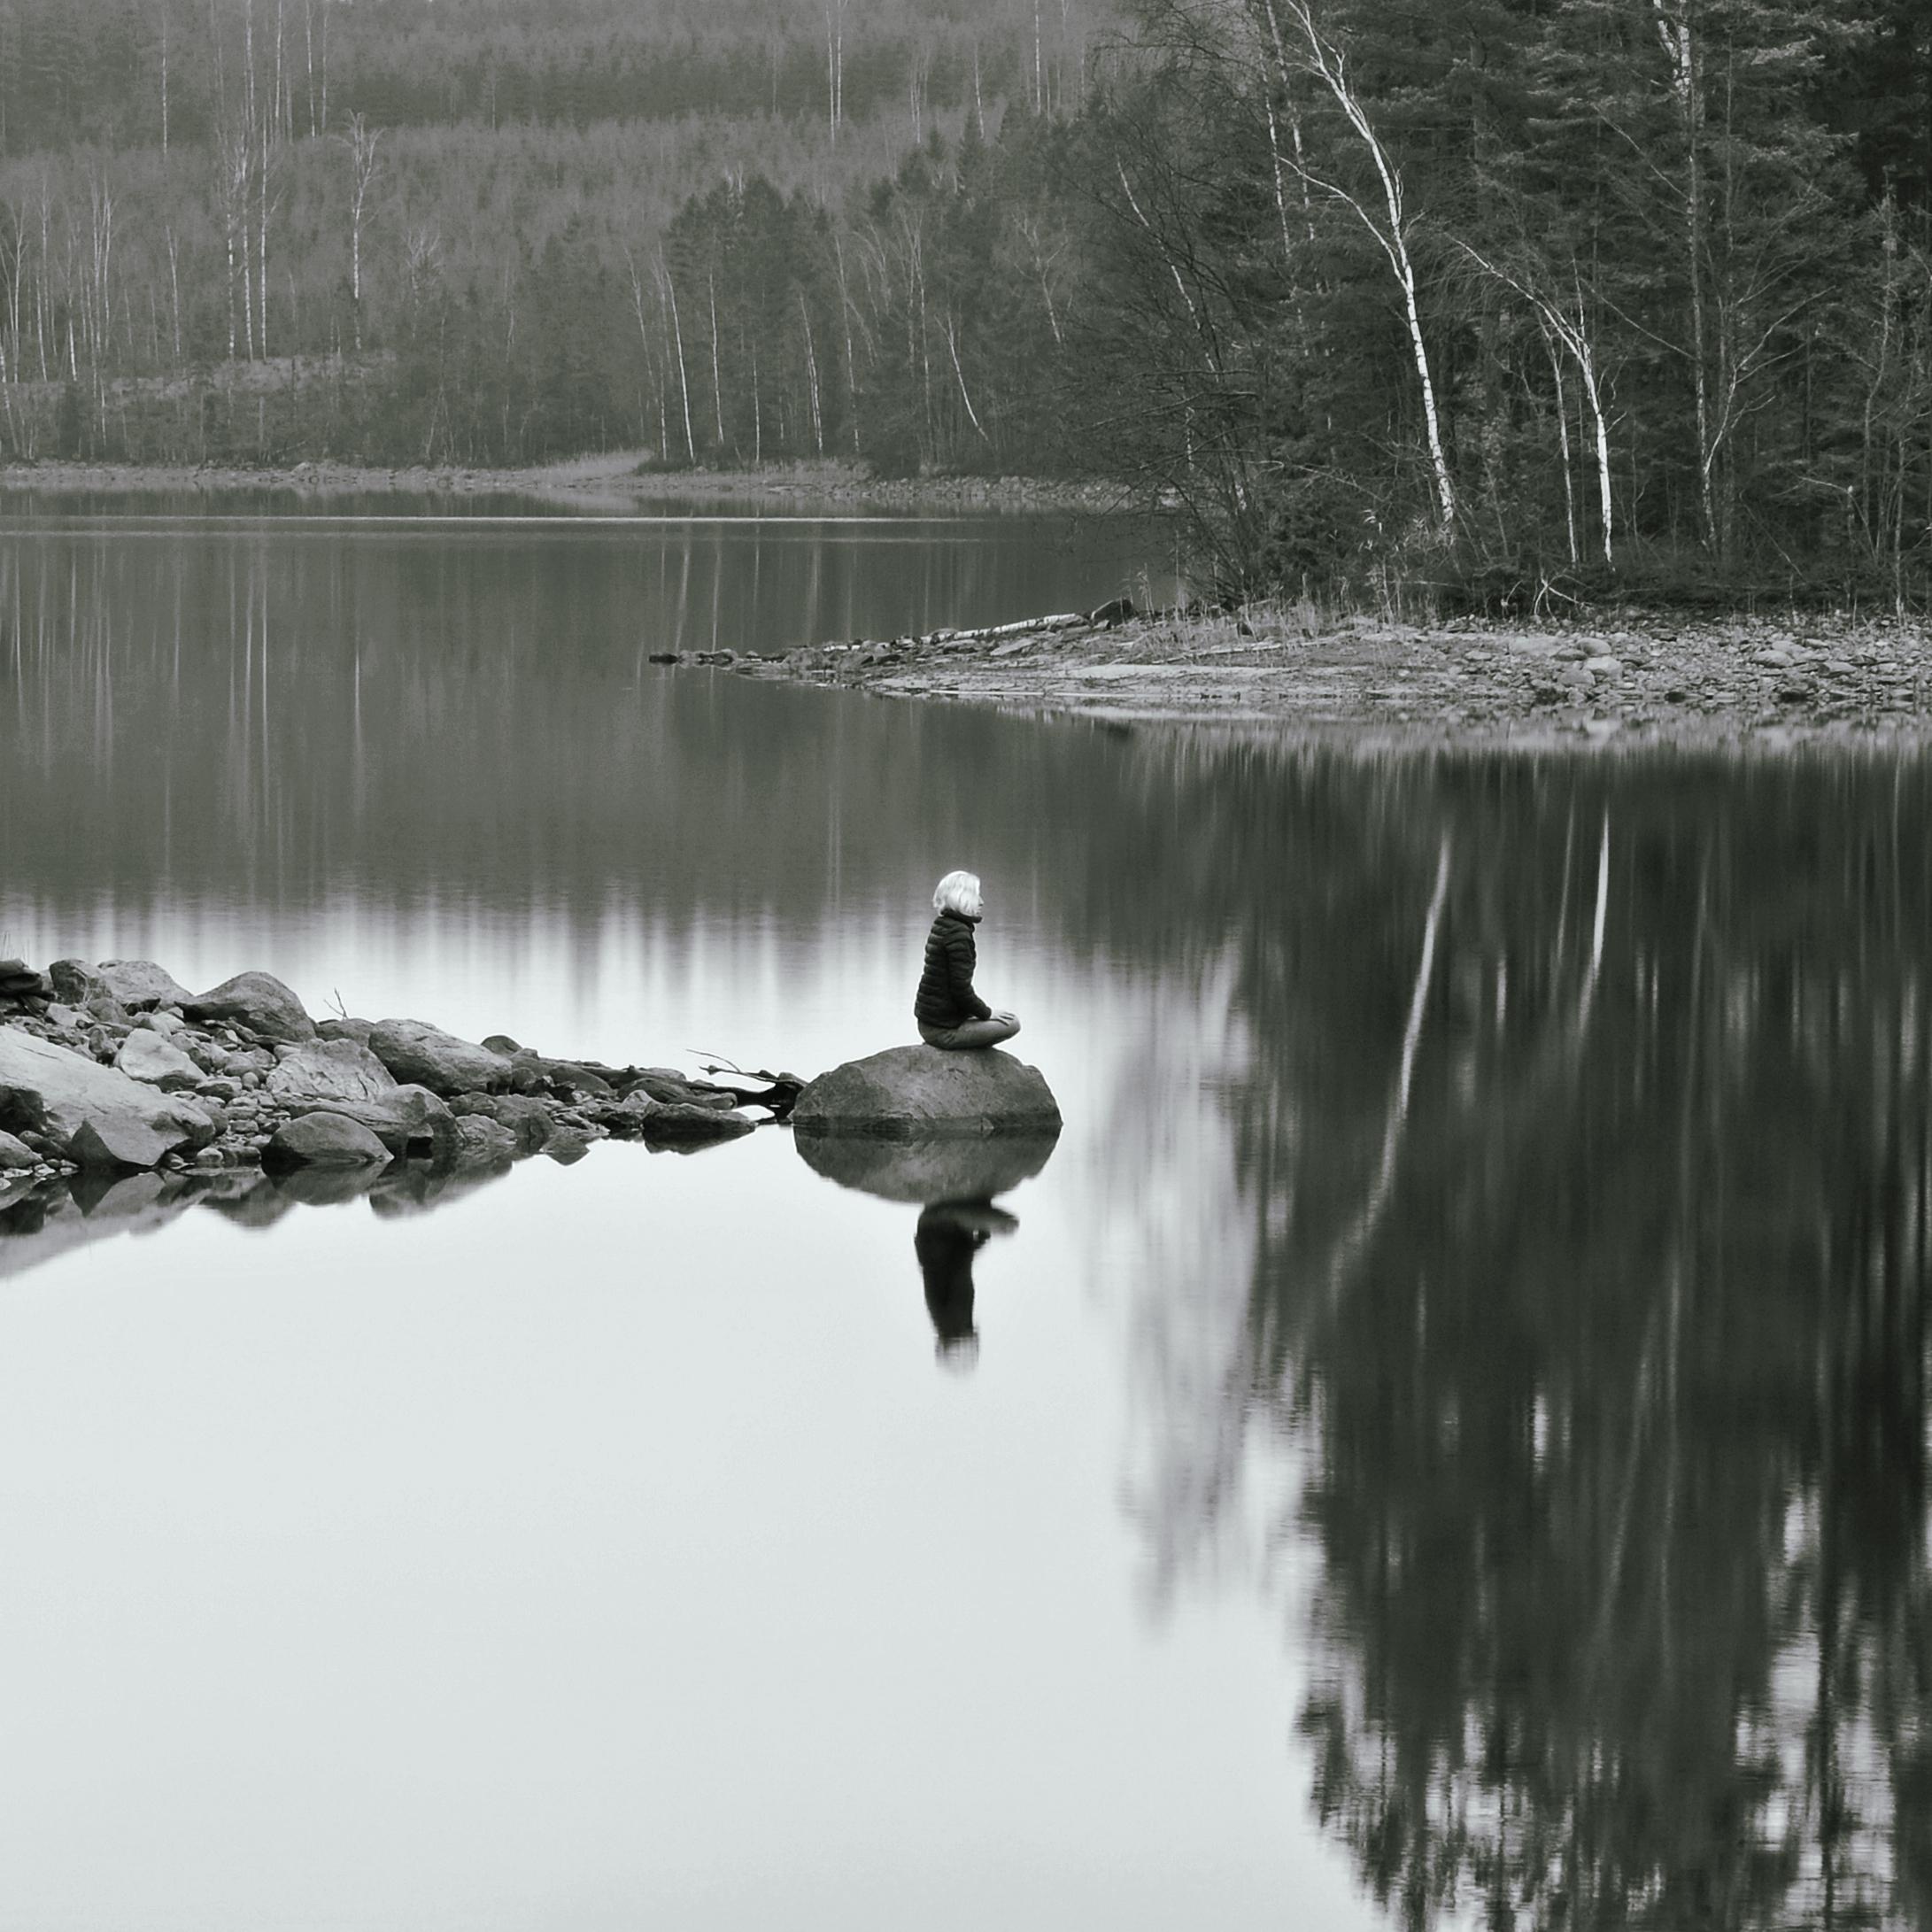 Hitta en egen plats i naturen